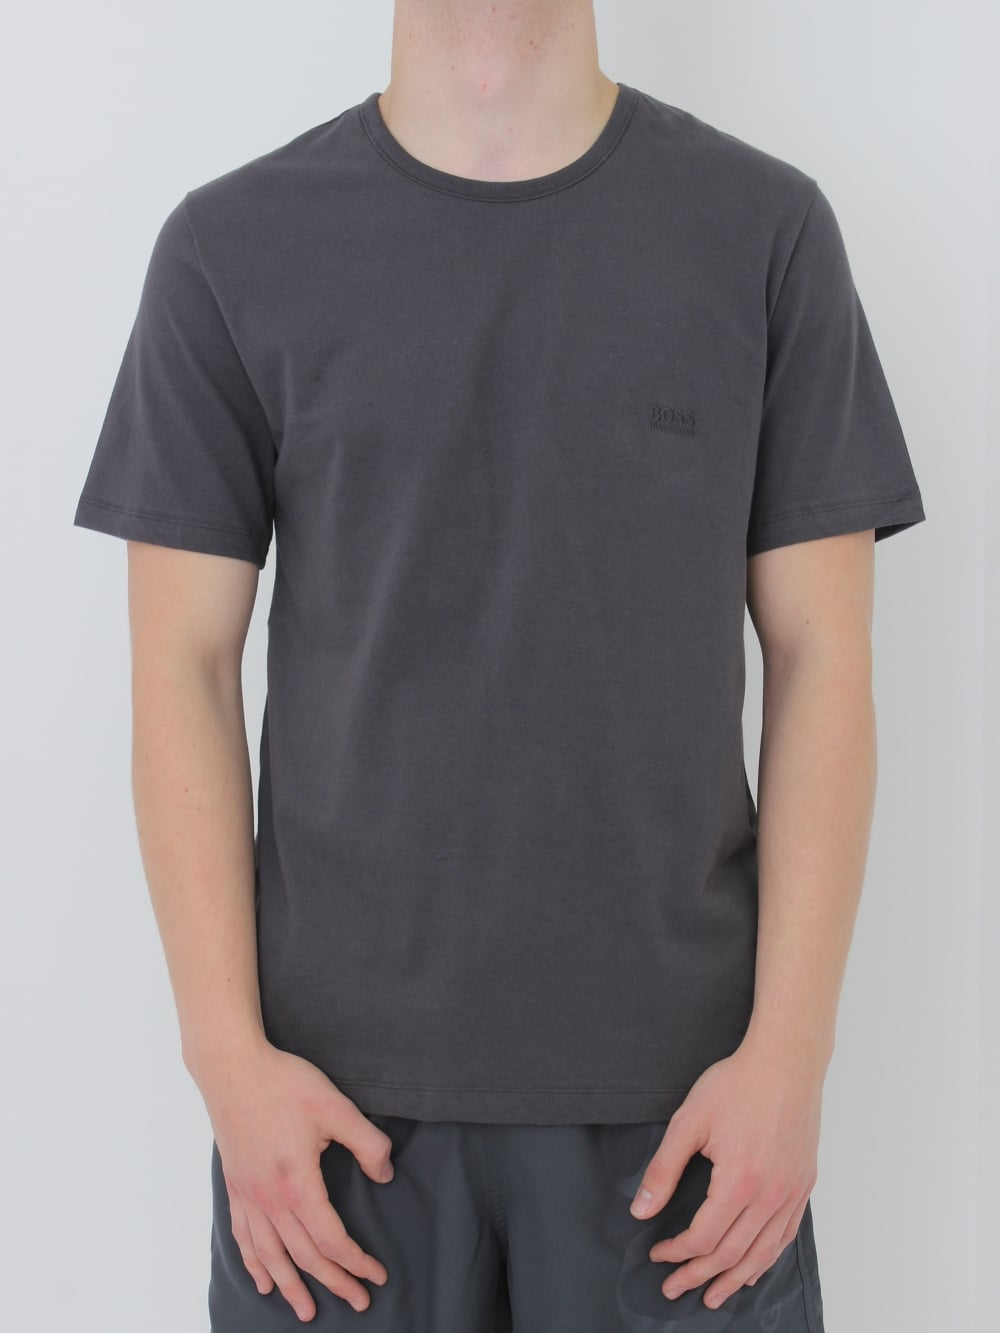 HUGO BOSS - BOSS Hugo Boss 3 Pack Crew Neck T.Shirts in Multi ... 0f1ac501c374